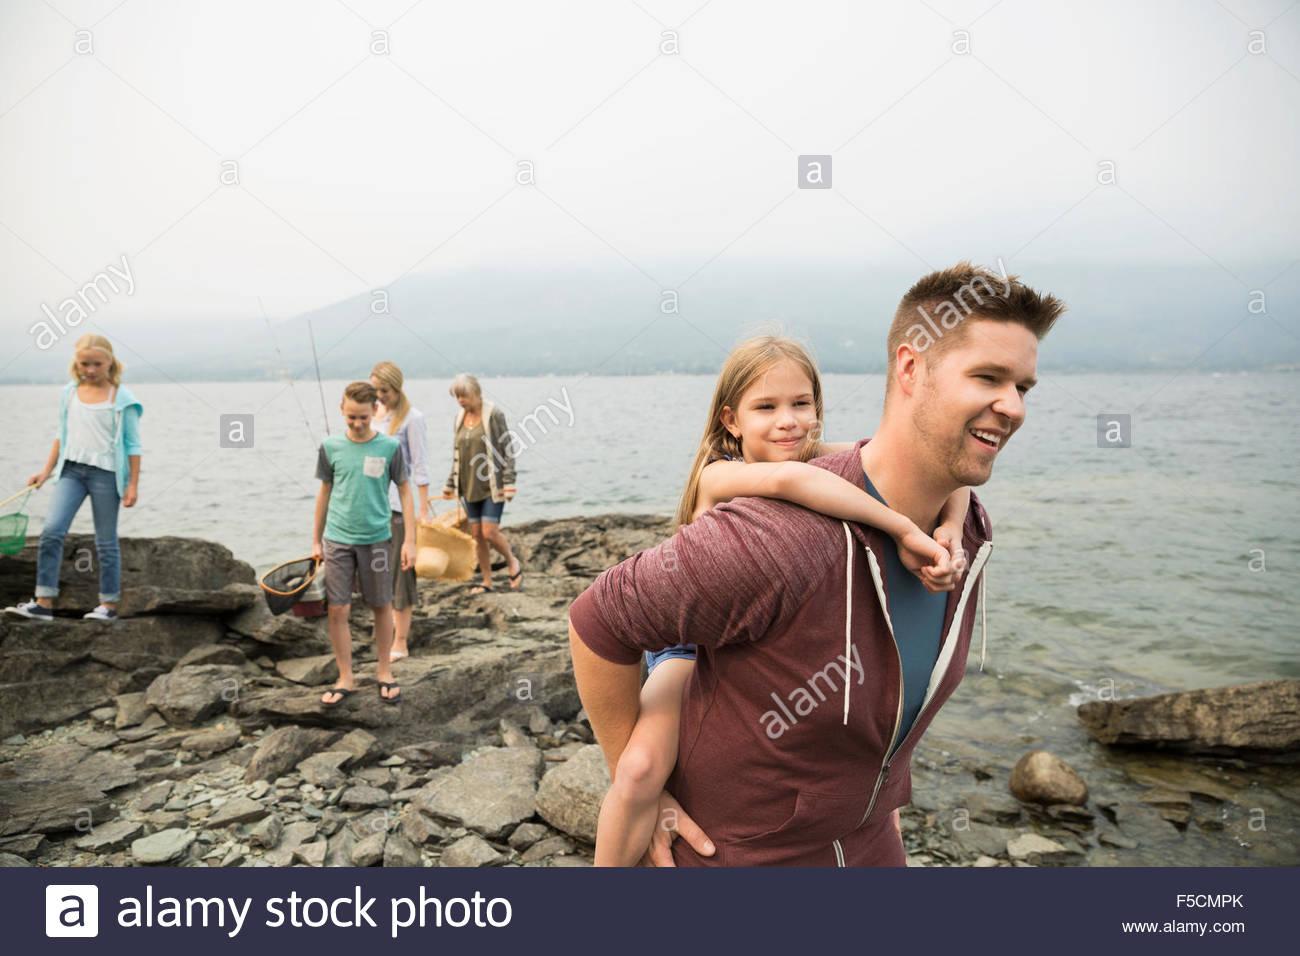 Father piggybacking daughter at craggy lakeside - Stock Image